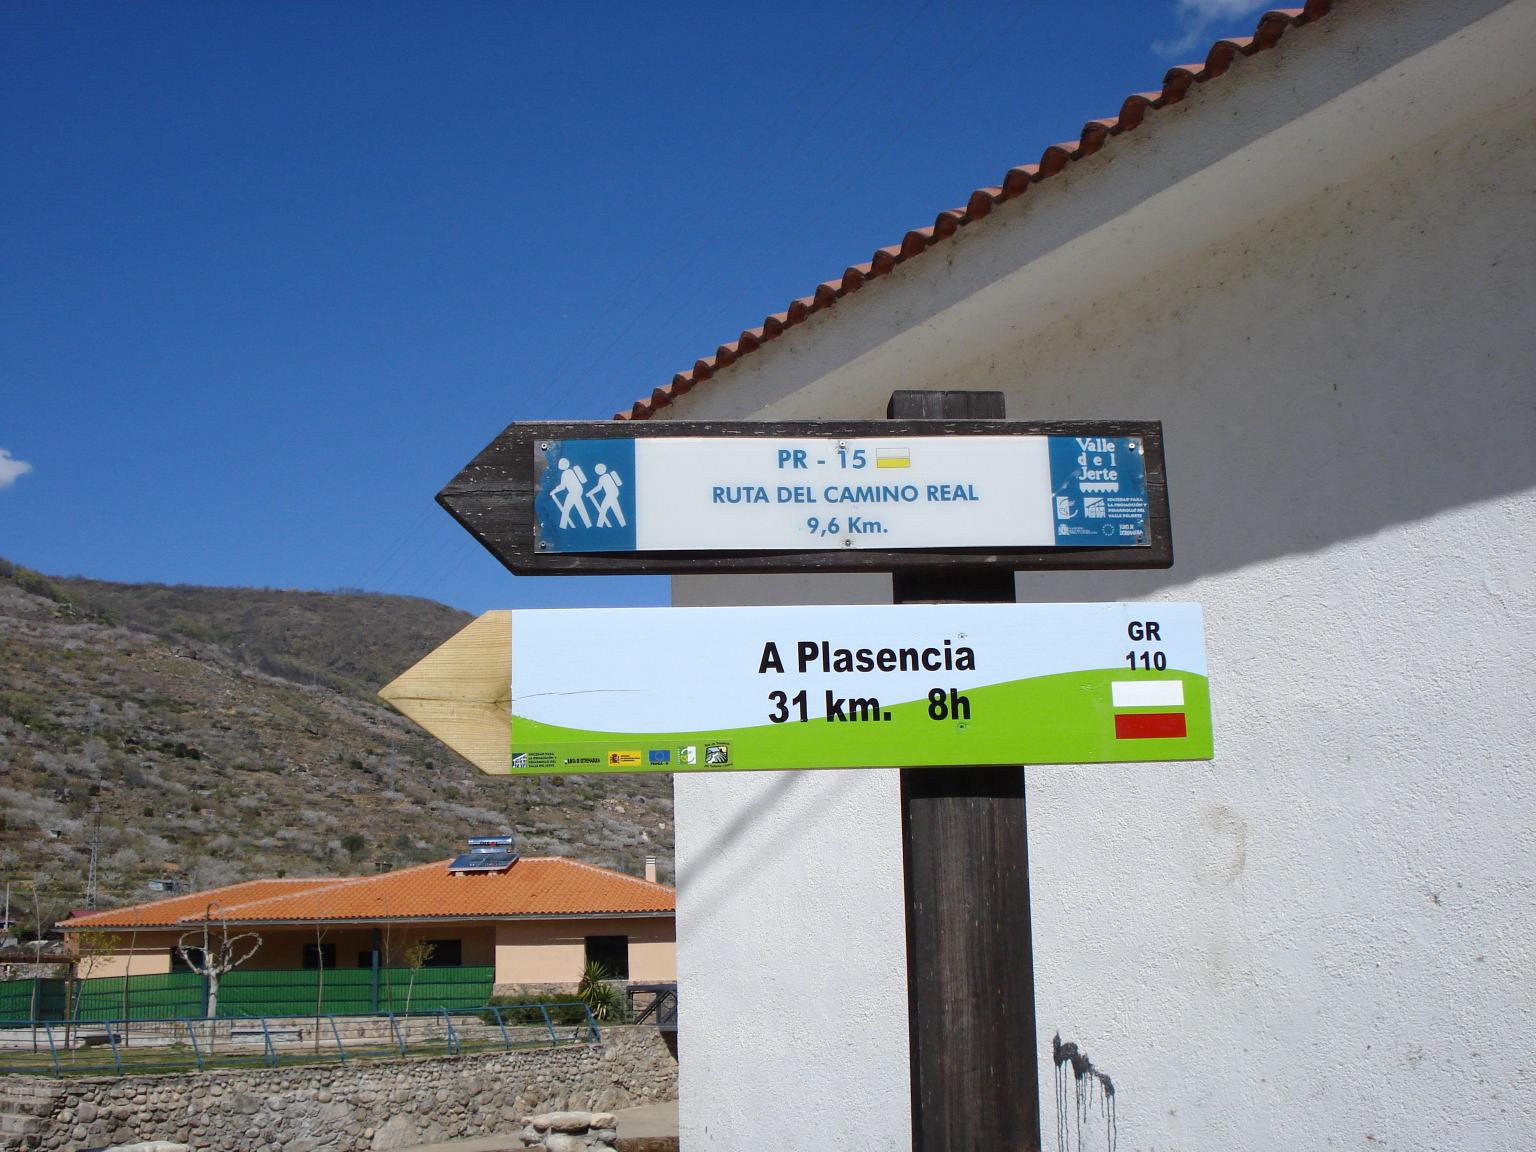 A Patear Pr Cc 15 Camino Real Navaconcejo Piornal